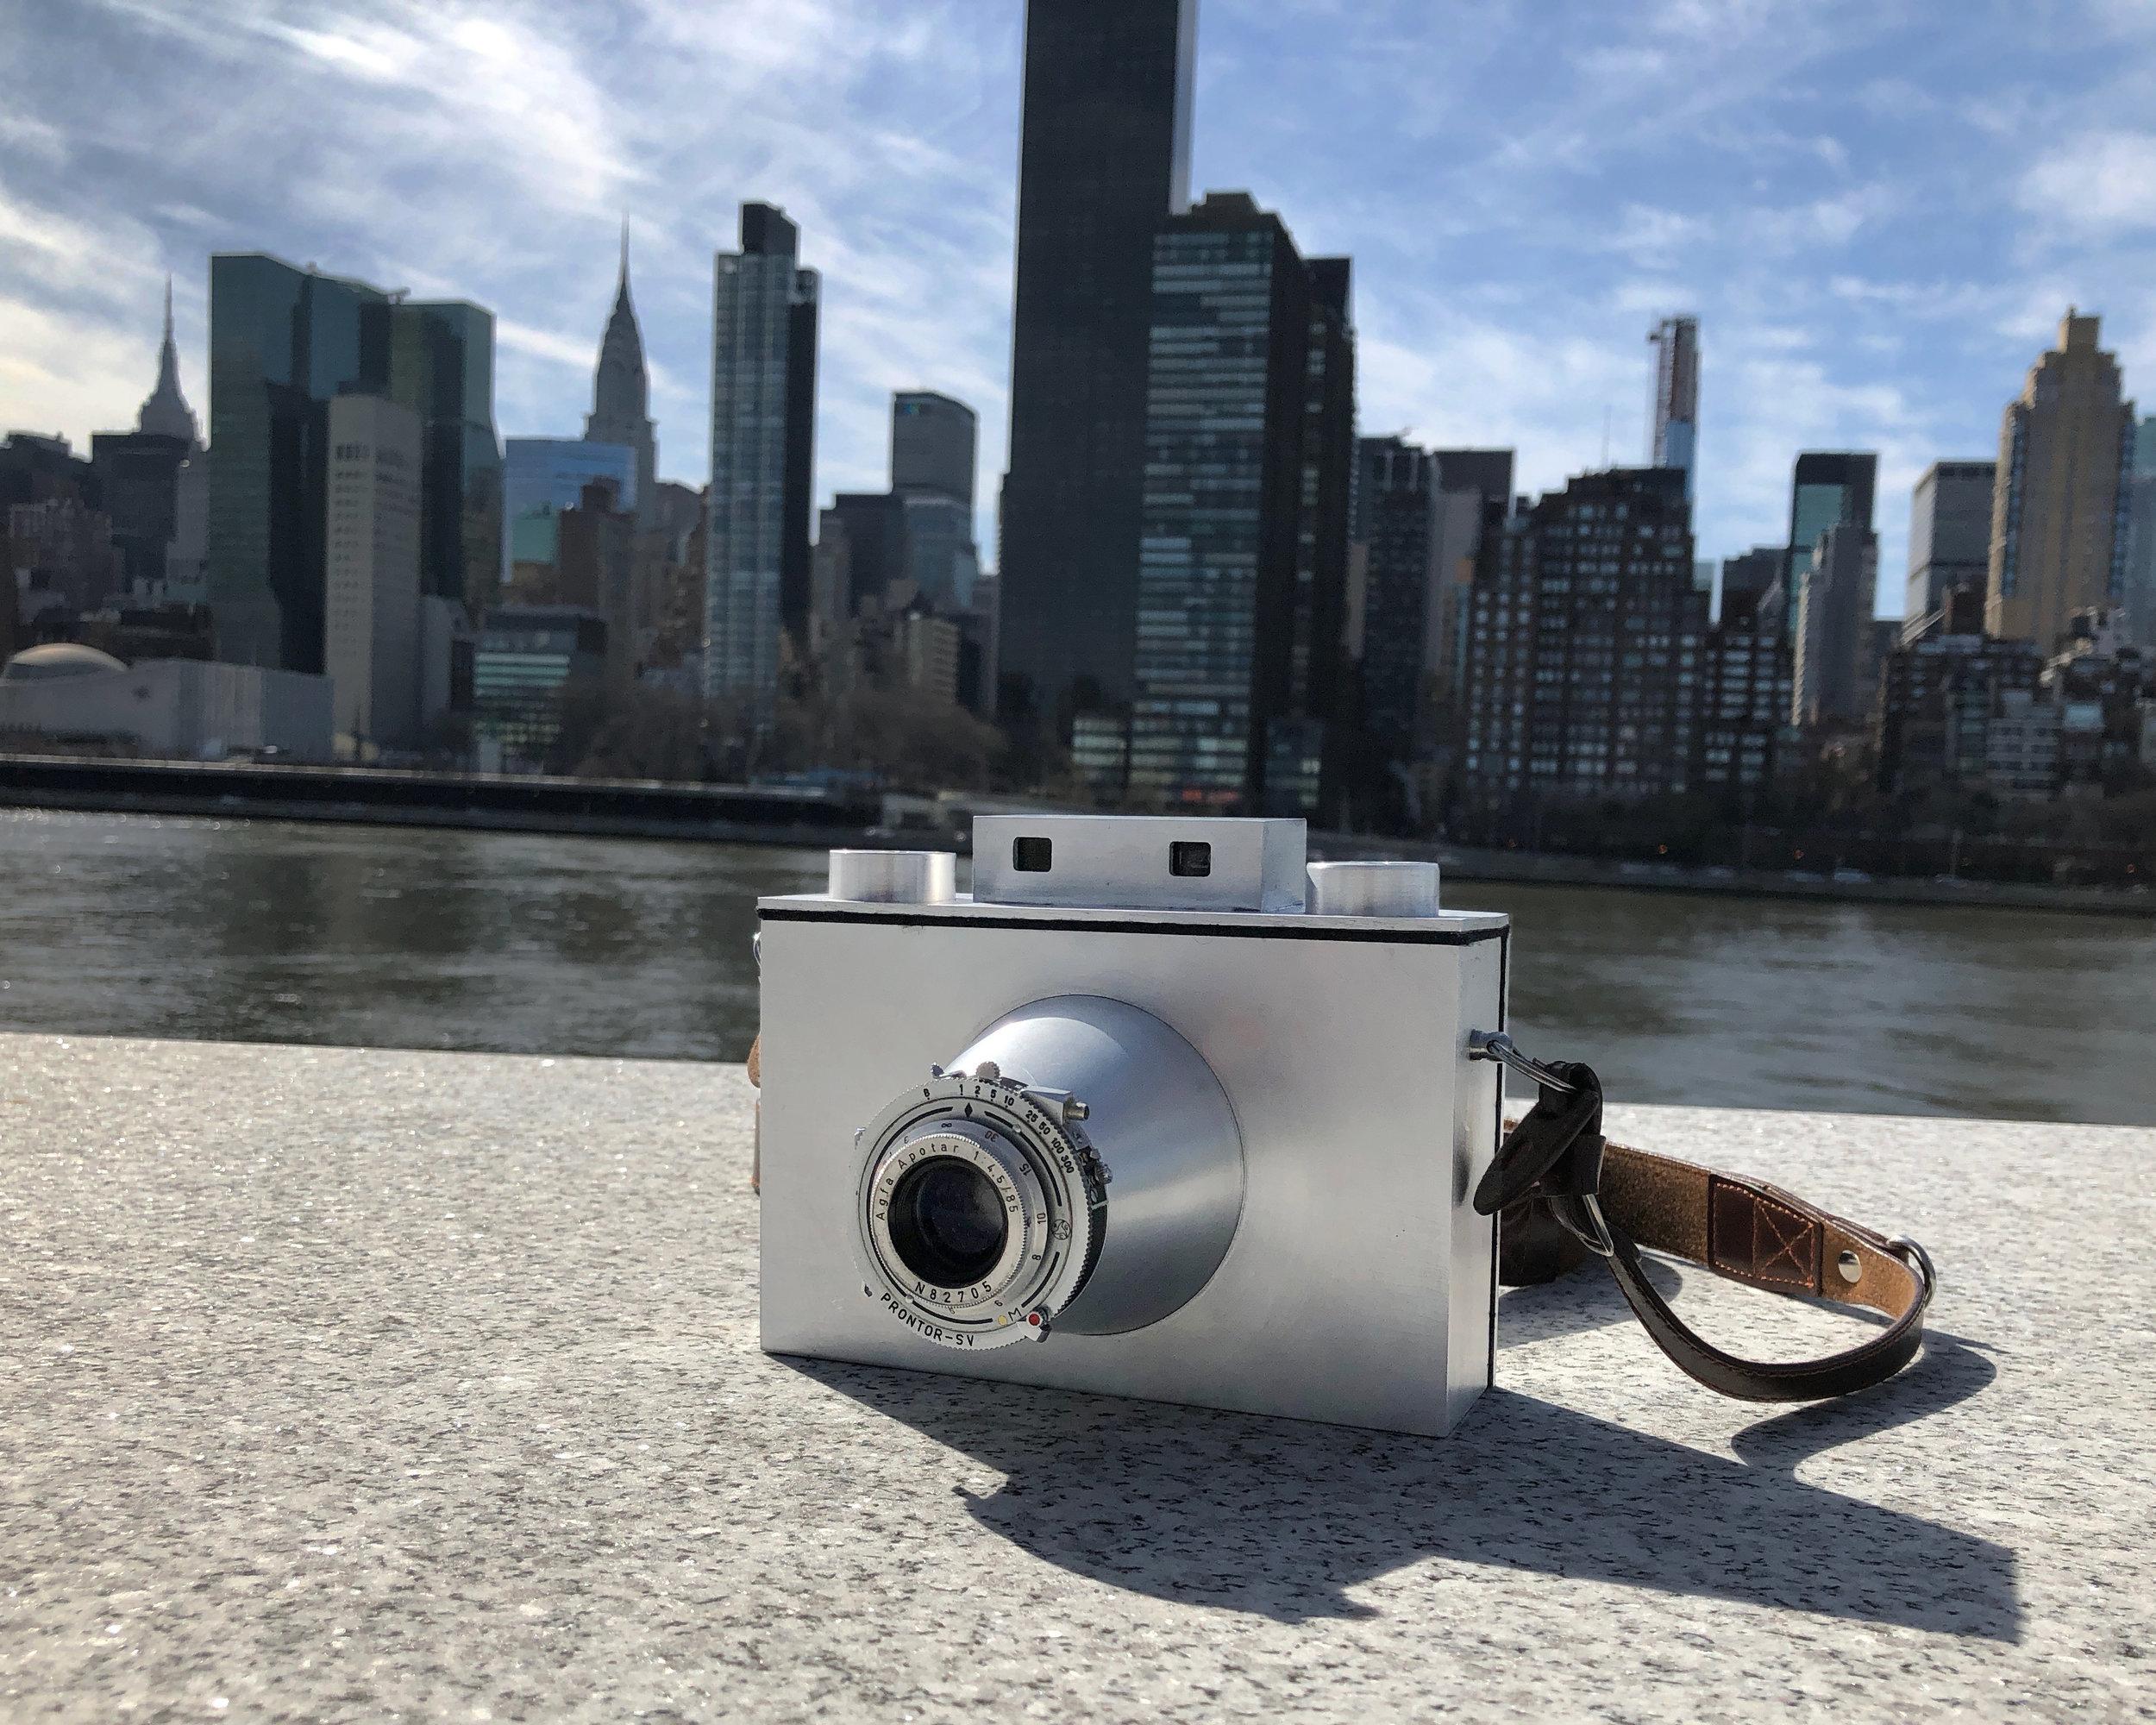 landers AL6 Mrk II handmade camera in New york city.jpg